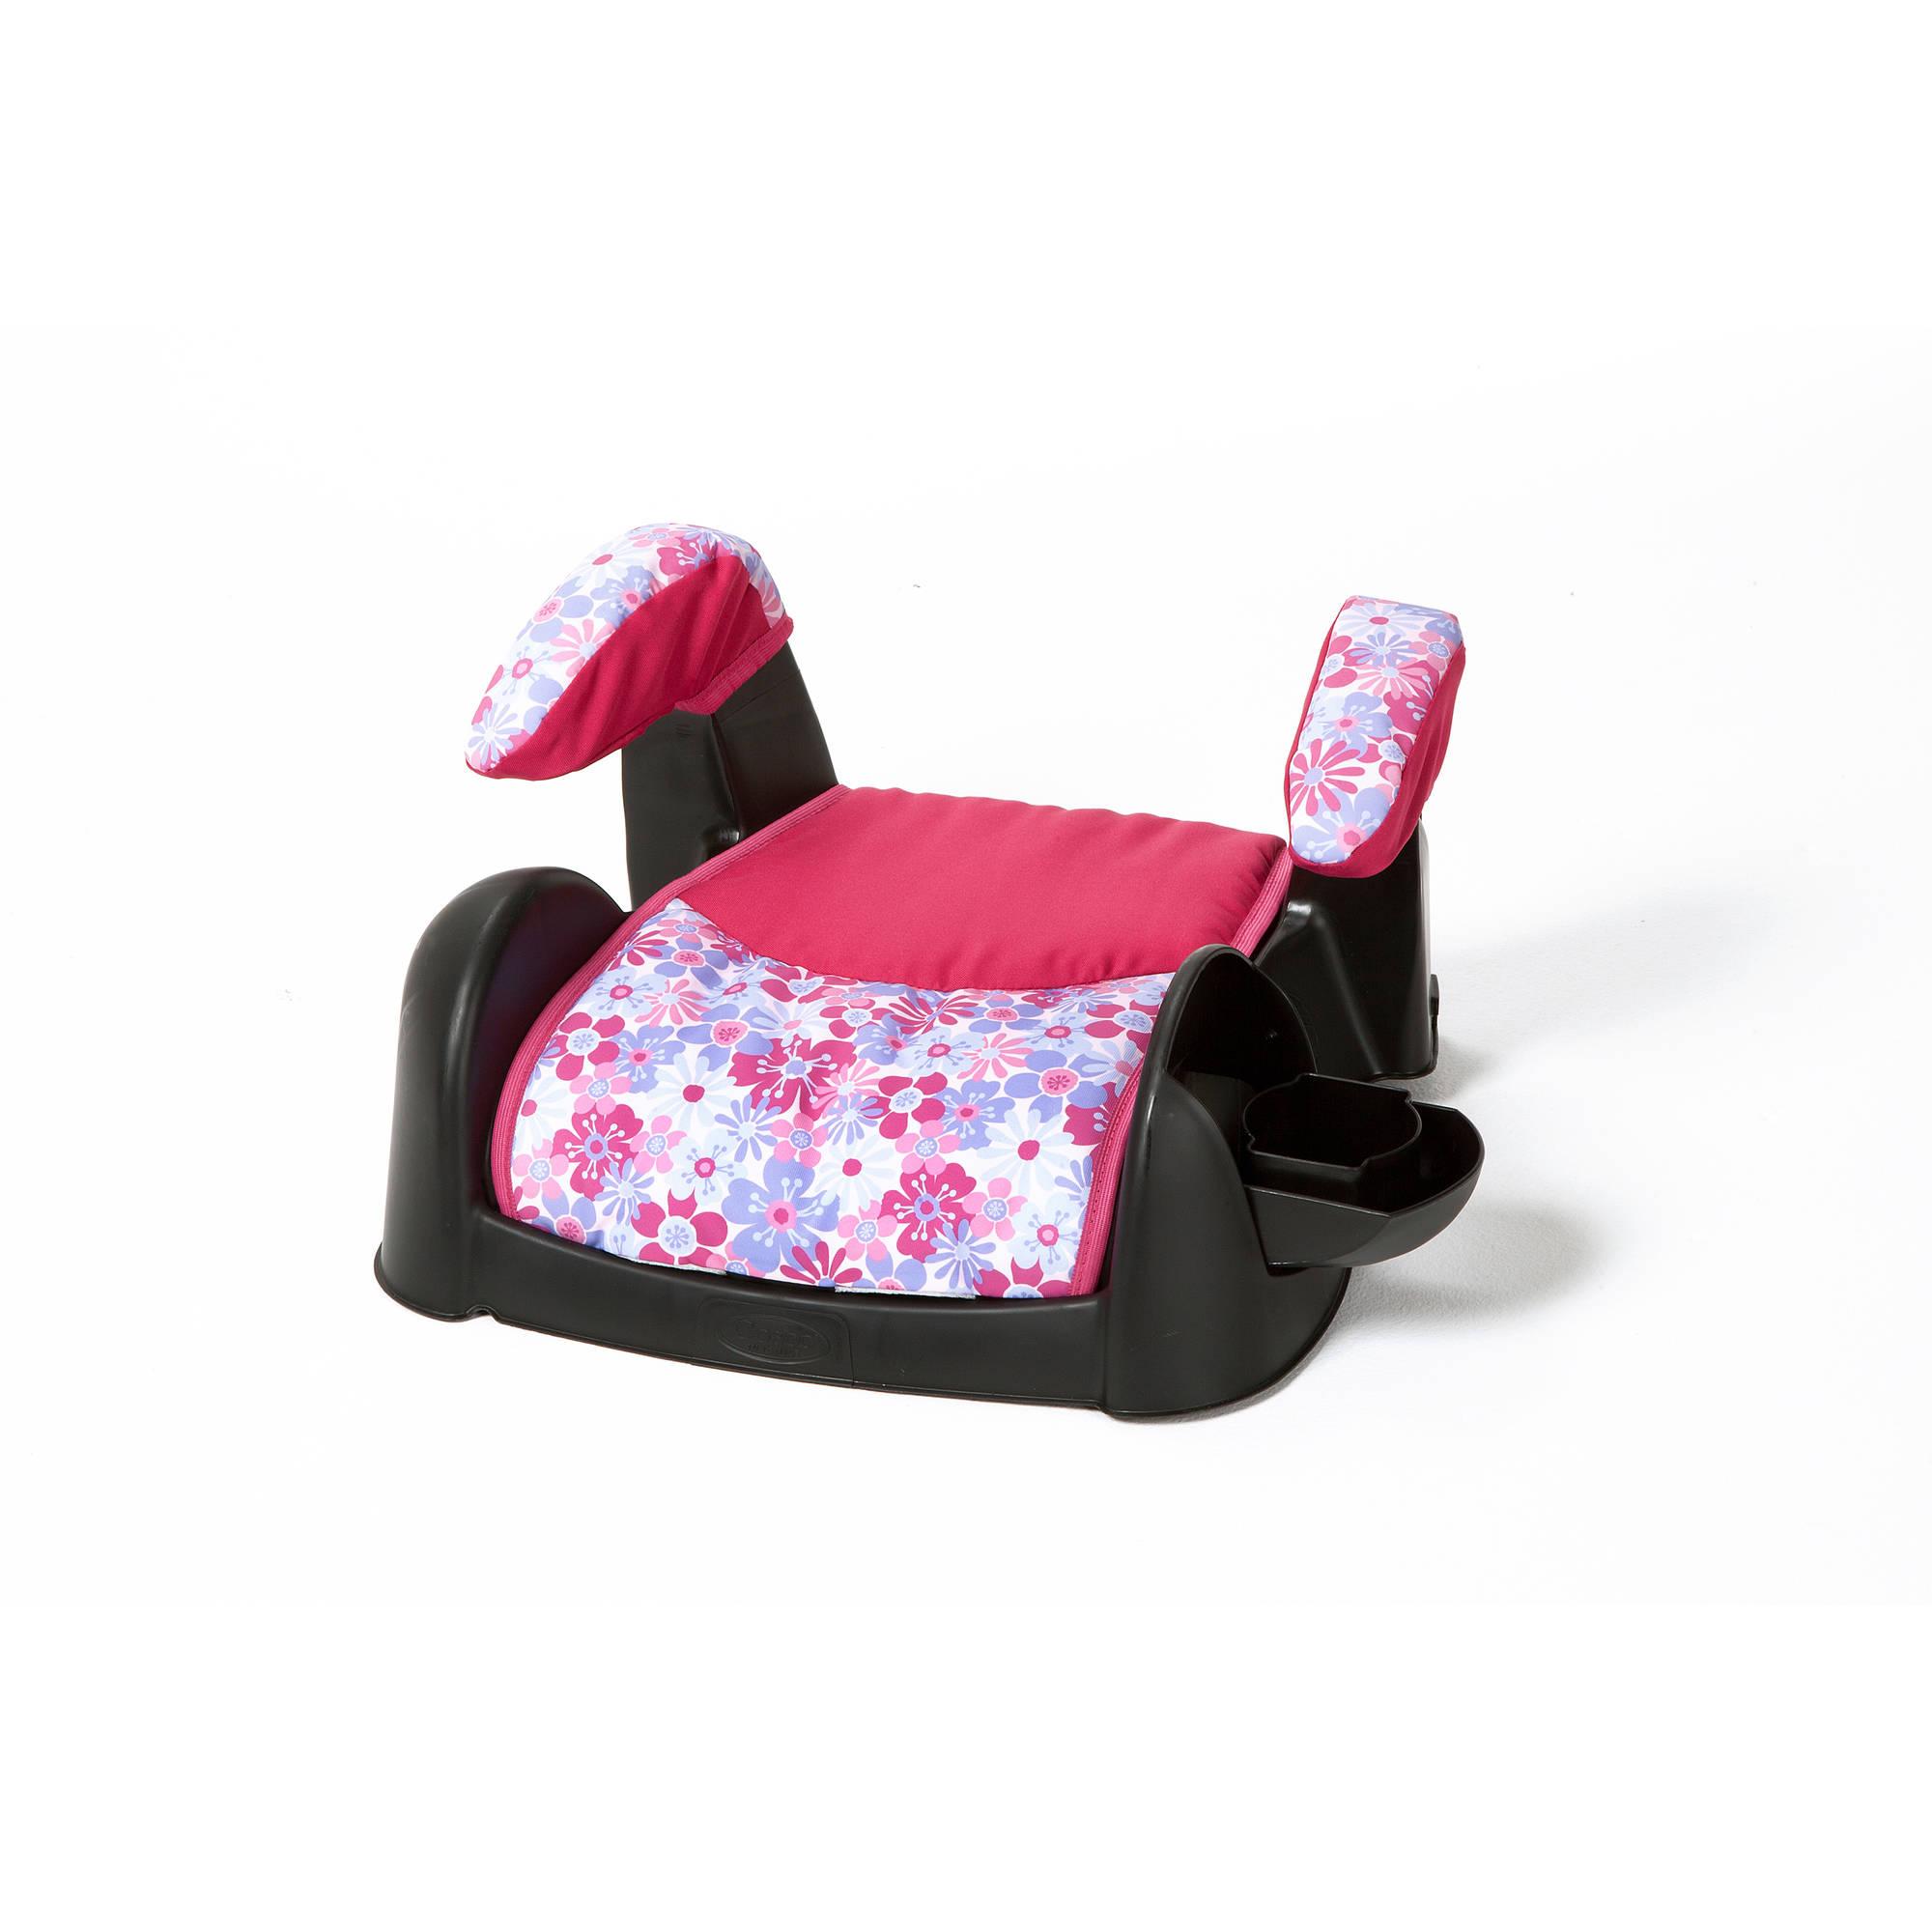 Cosco Ambassador Booster Car Seat, Chloe